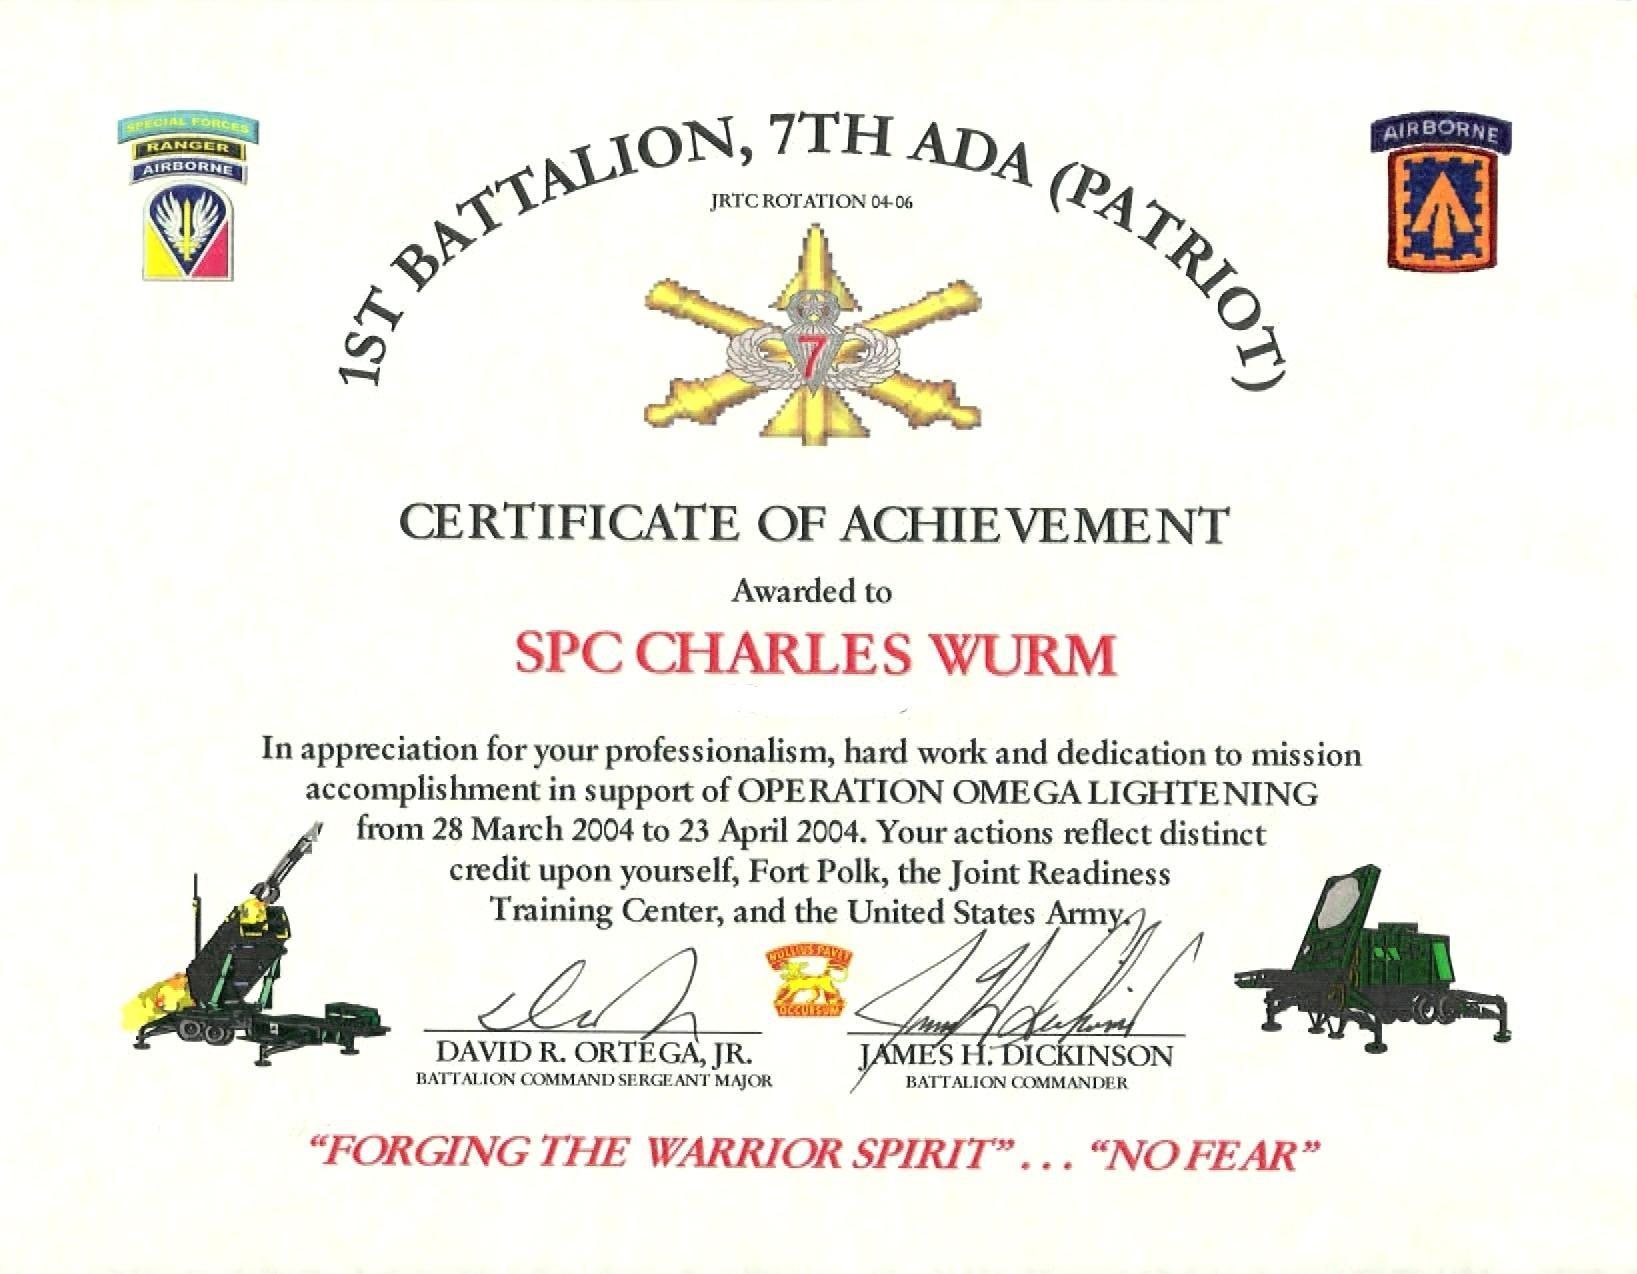 Certificate Of Appreciation Template Us Army Intended For intended for Free Army Certificate Of Achievement Template